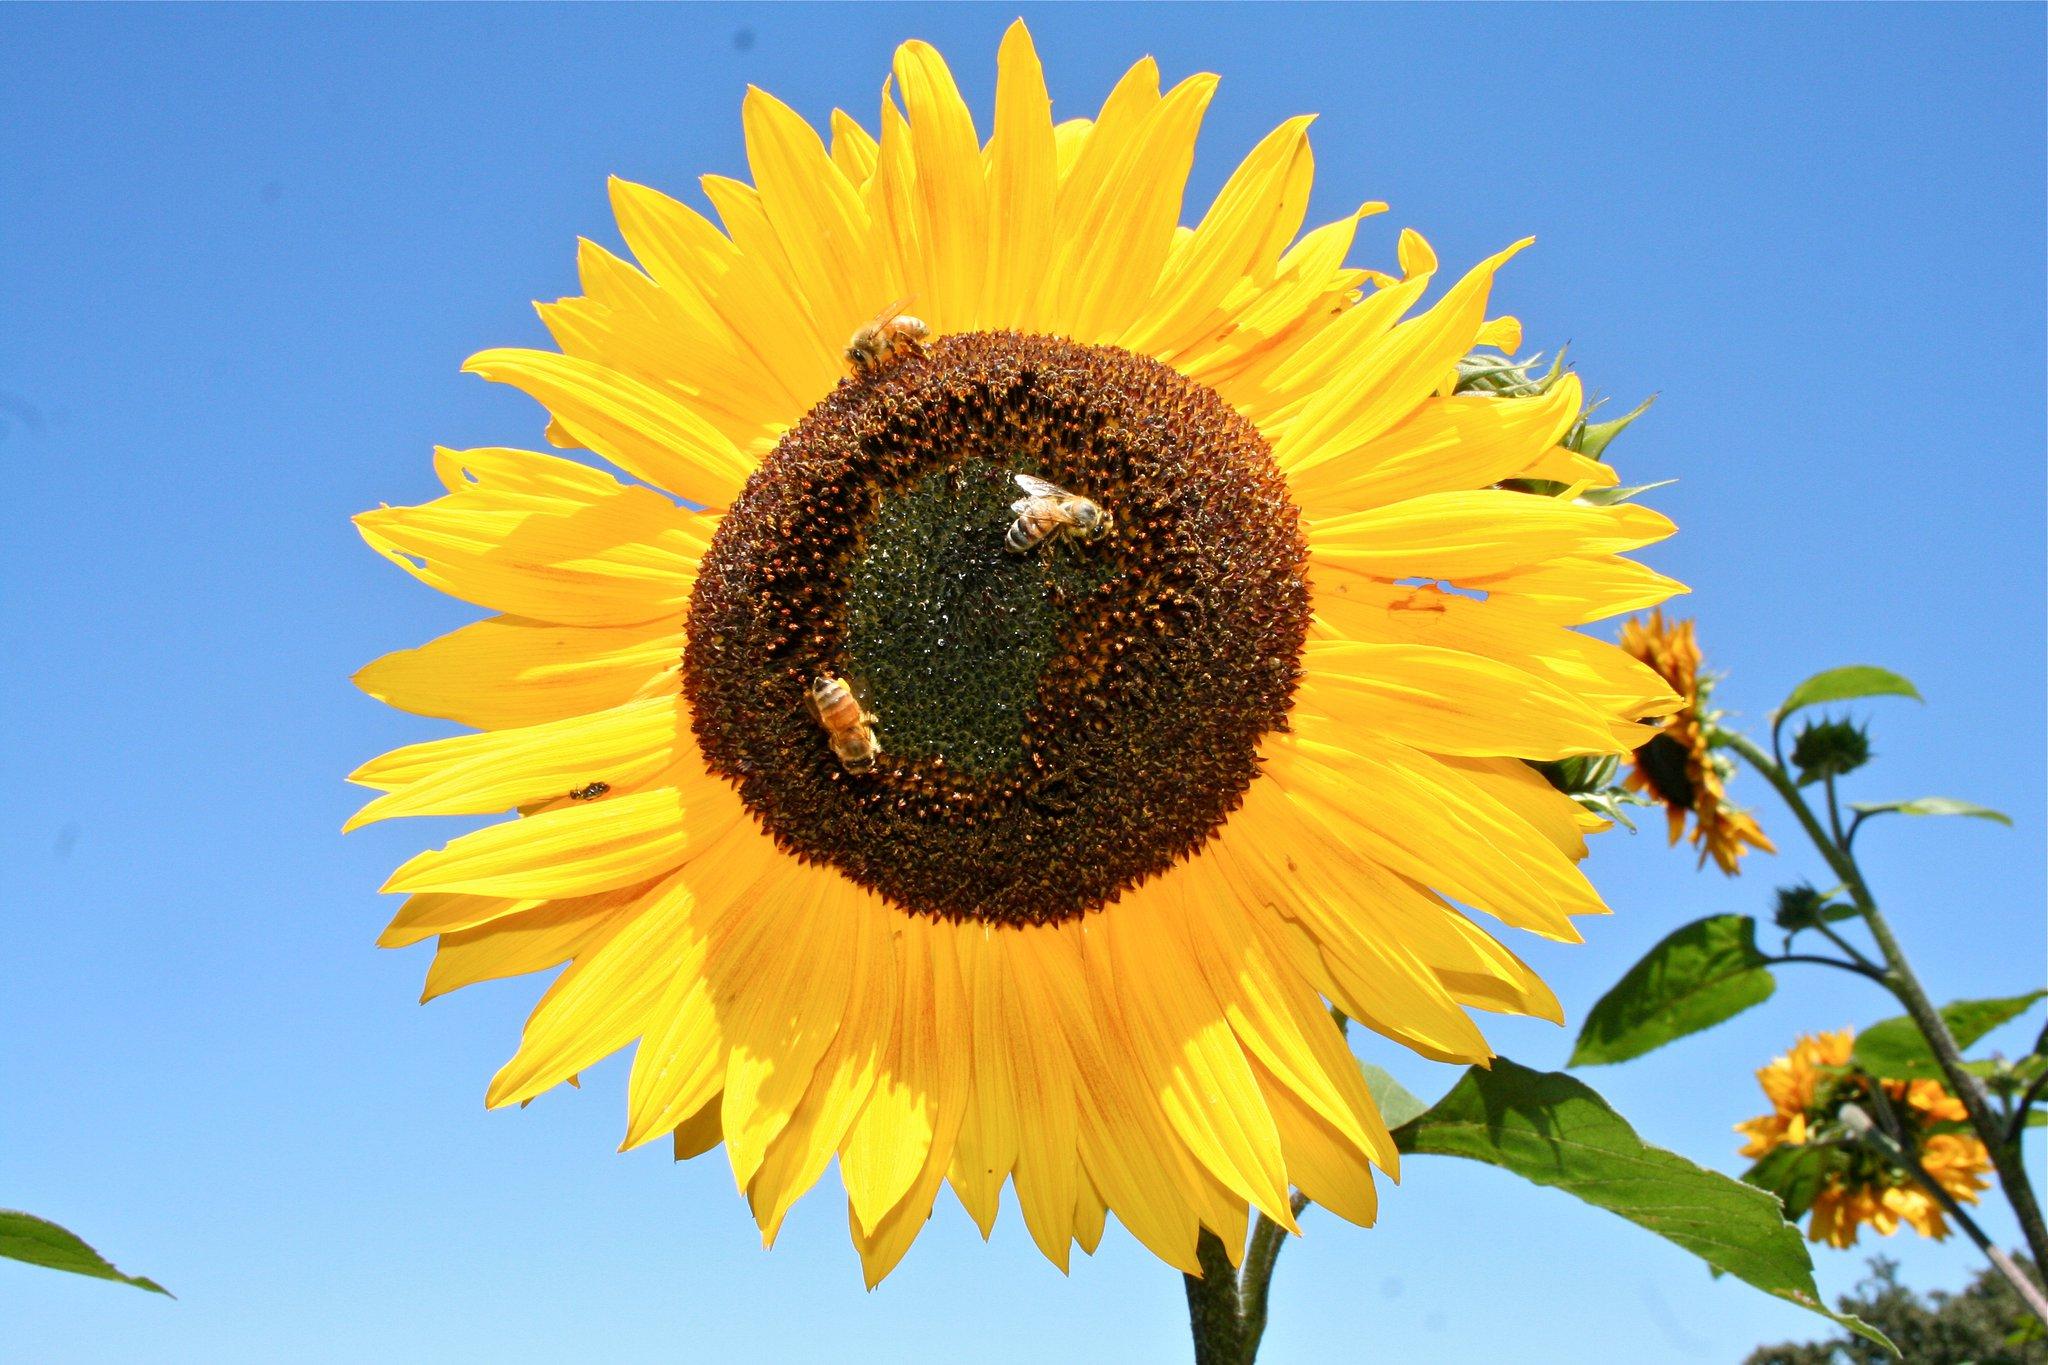 Sunflower by Lisa Reagan